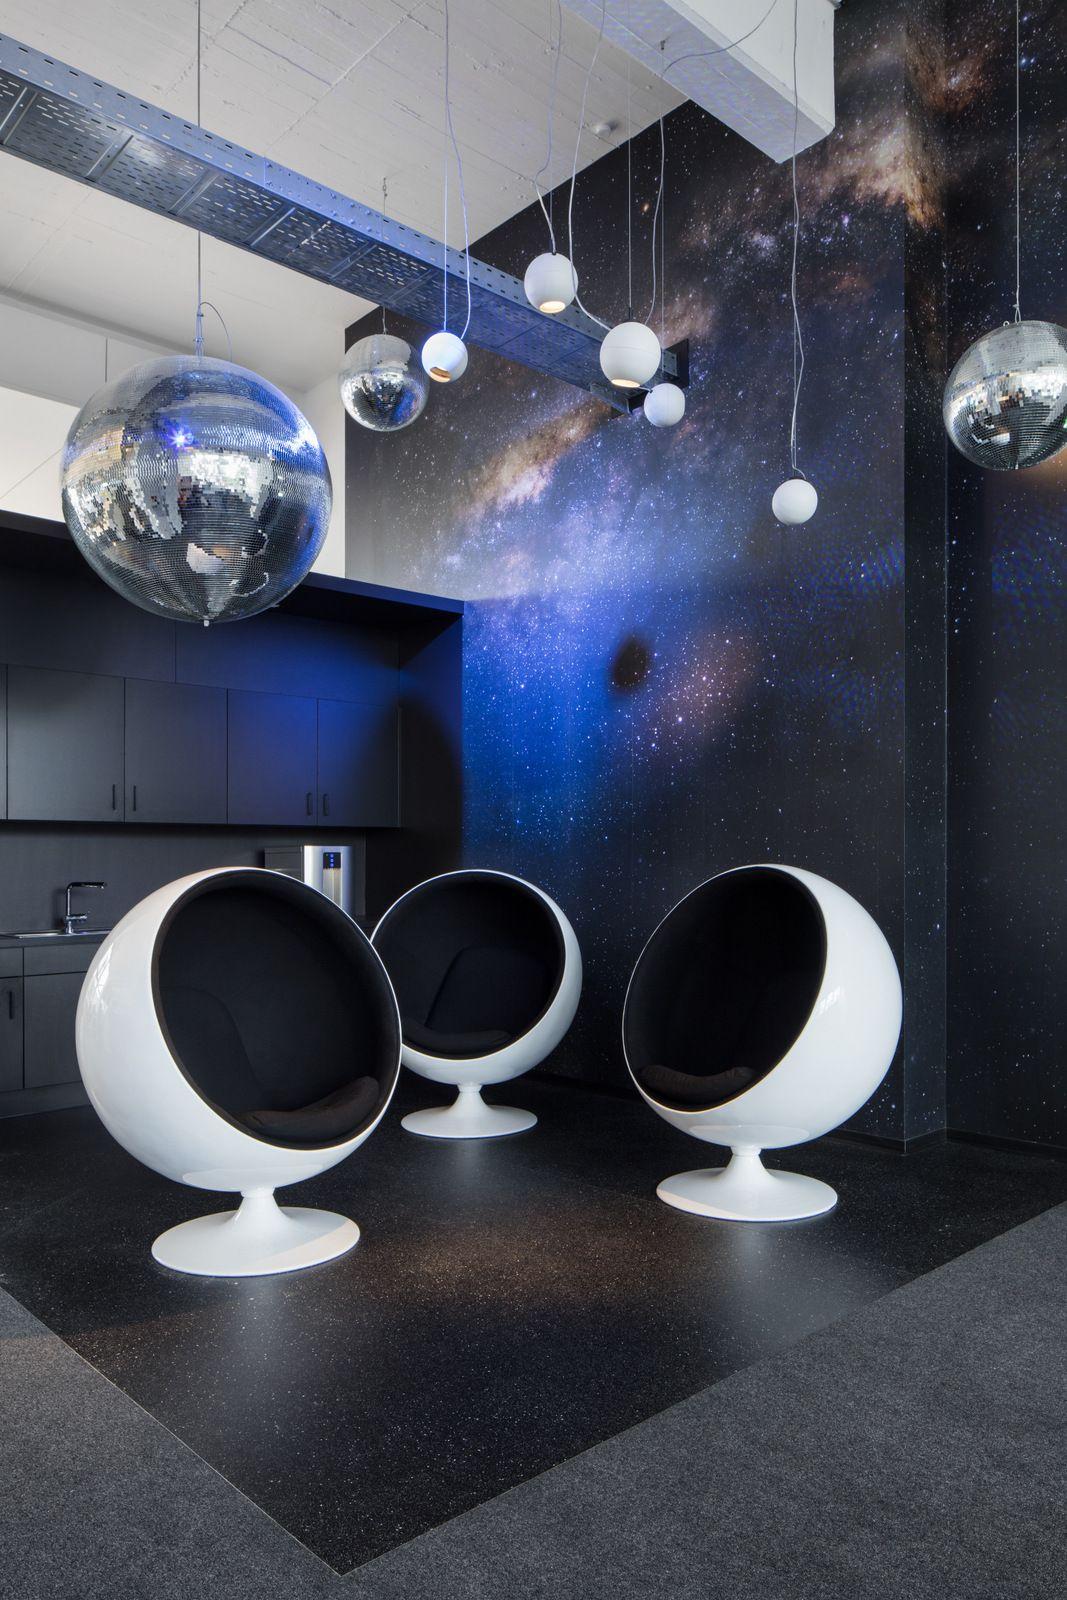 eckbank k che gebraucht in magdeburg k che kiefer interaktive ikea fyndig hausmittel gegen. Black Bedroom Furniture Sets. Home Design Ideas